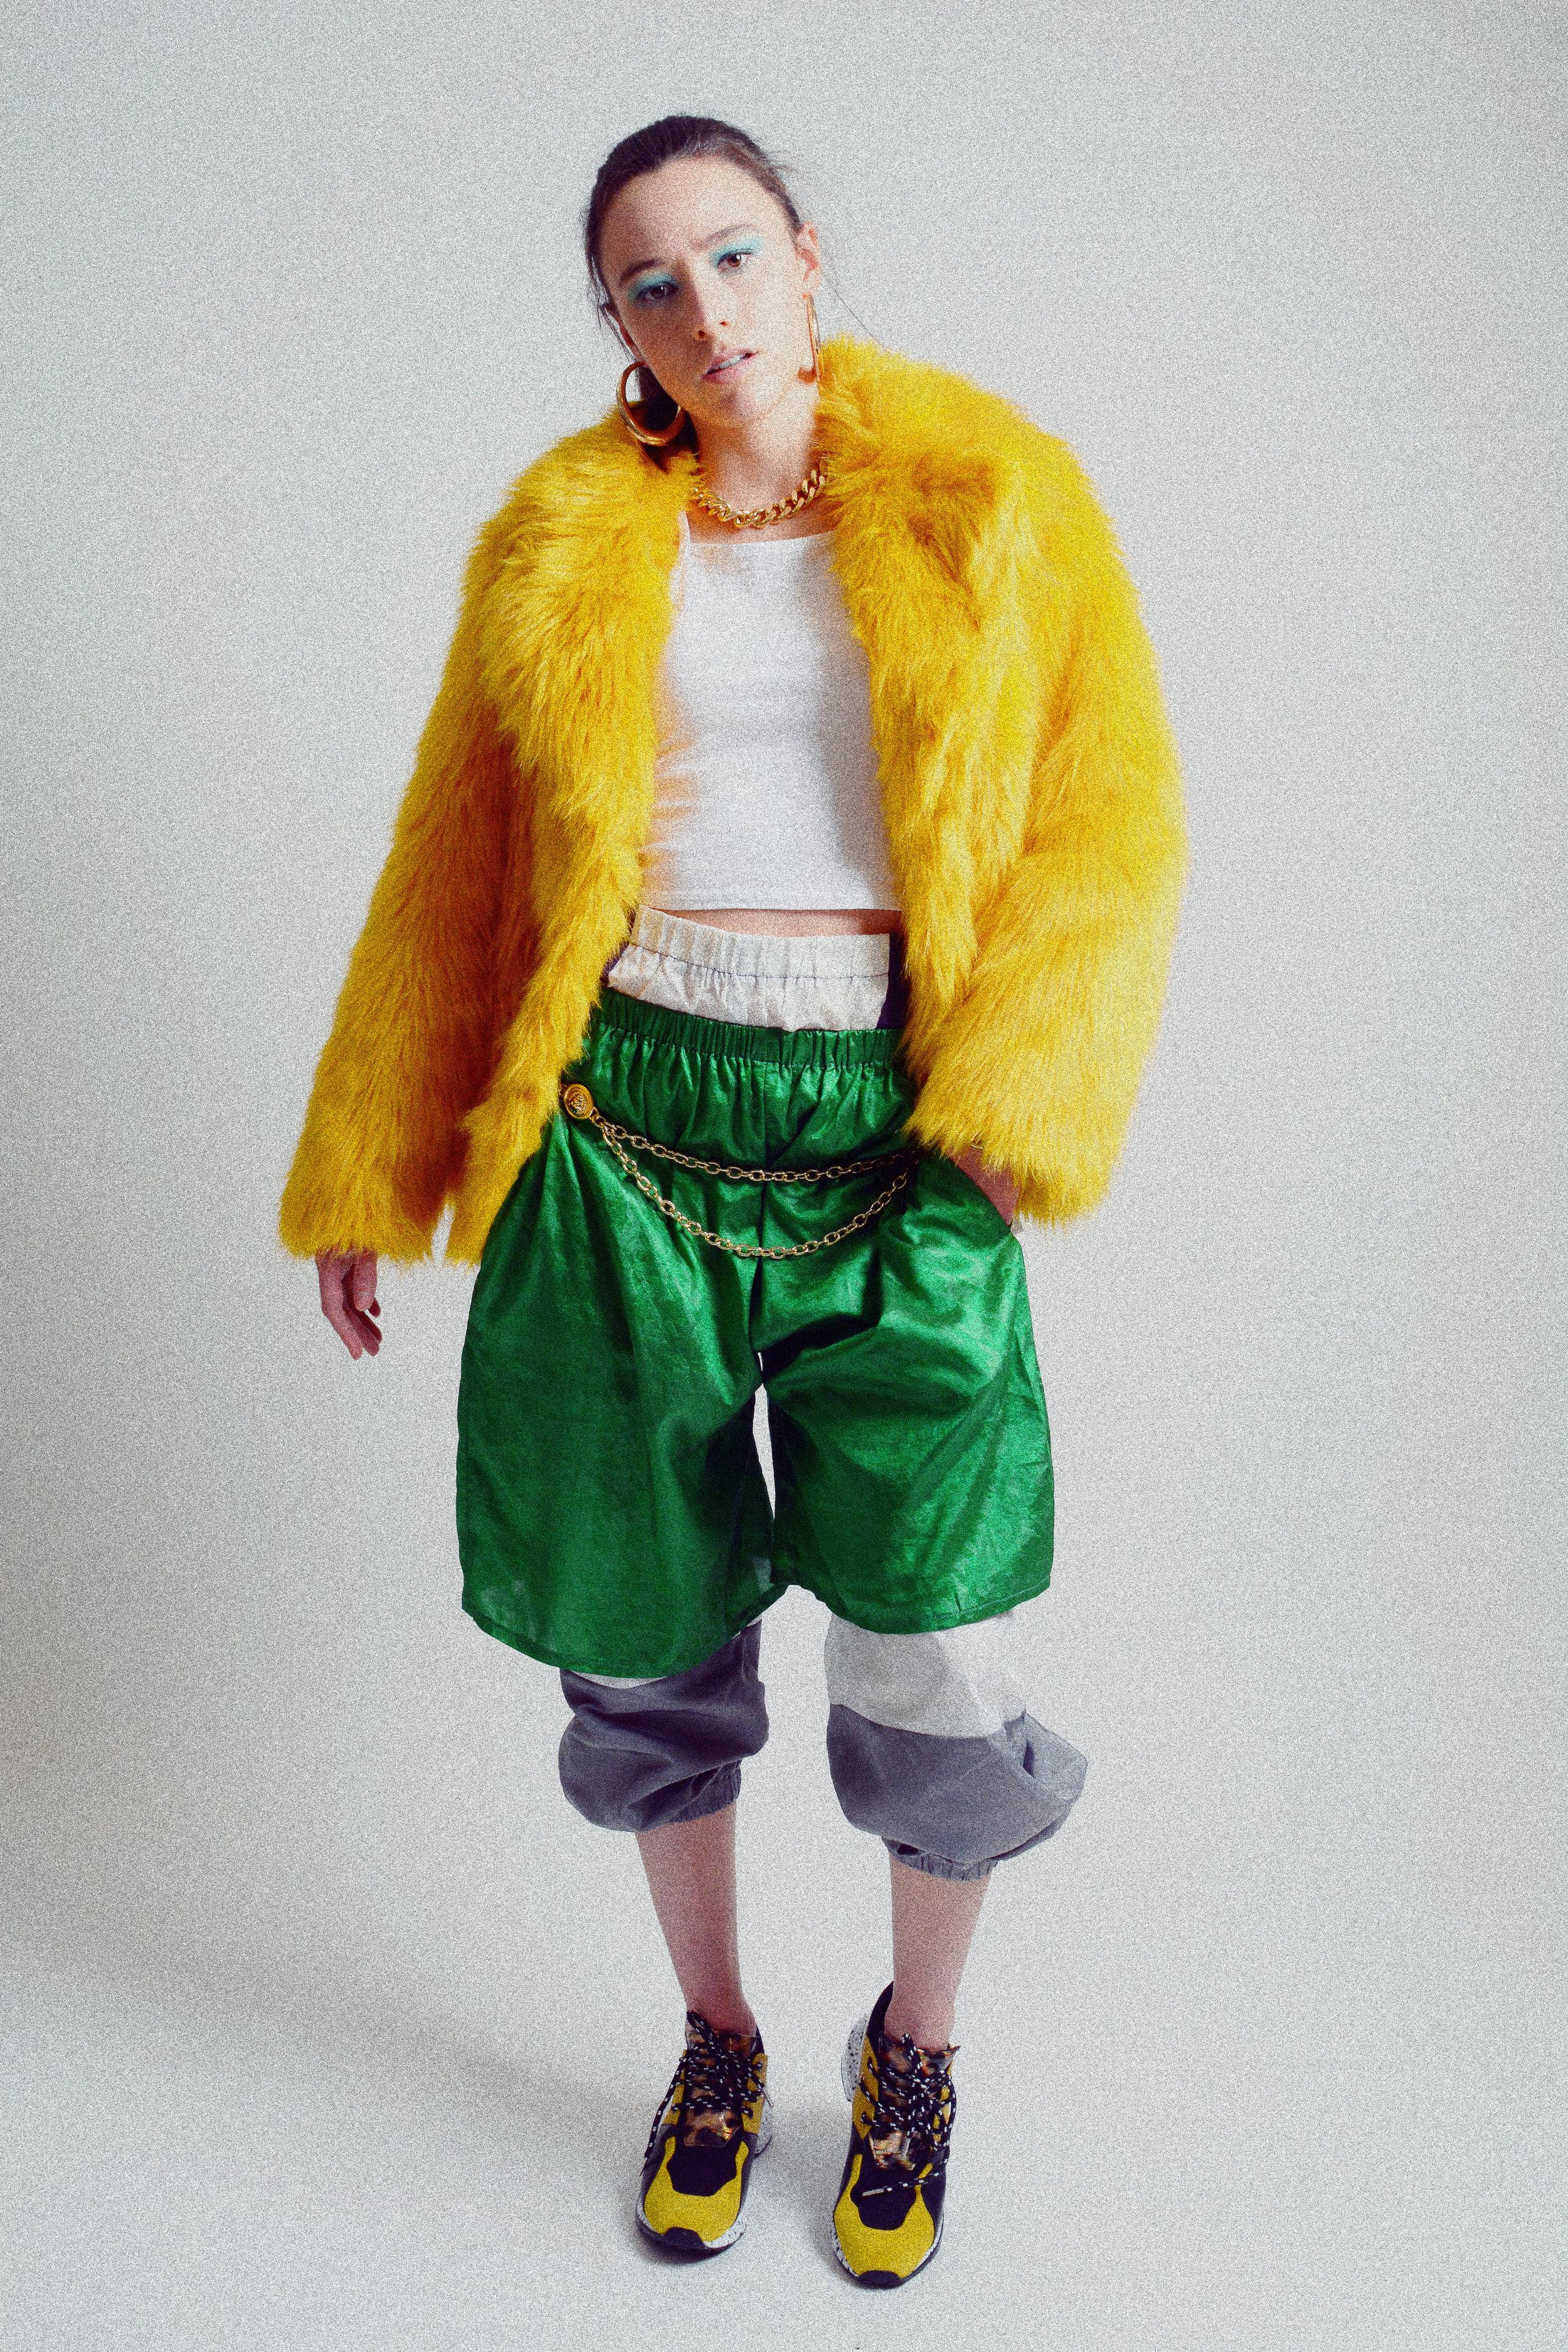 Jacket: TopShop Tank top: H&M Pants: Fashionnova Shorts: Alex S. Yu Shoes: Steve Madden Chain Belt: TopShop Necklace: H&M Earrings and bracelet: Aldo